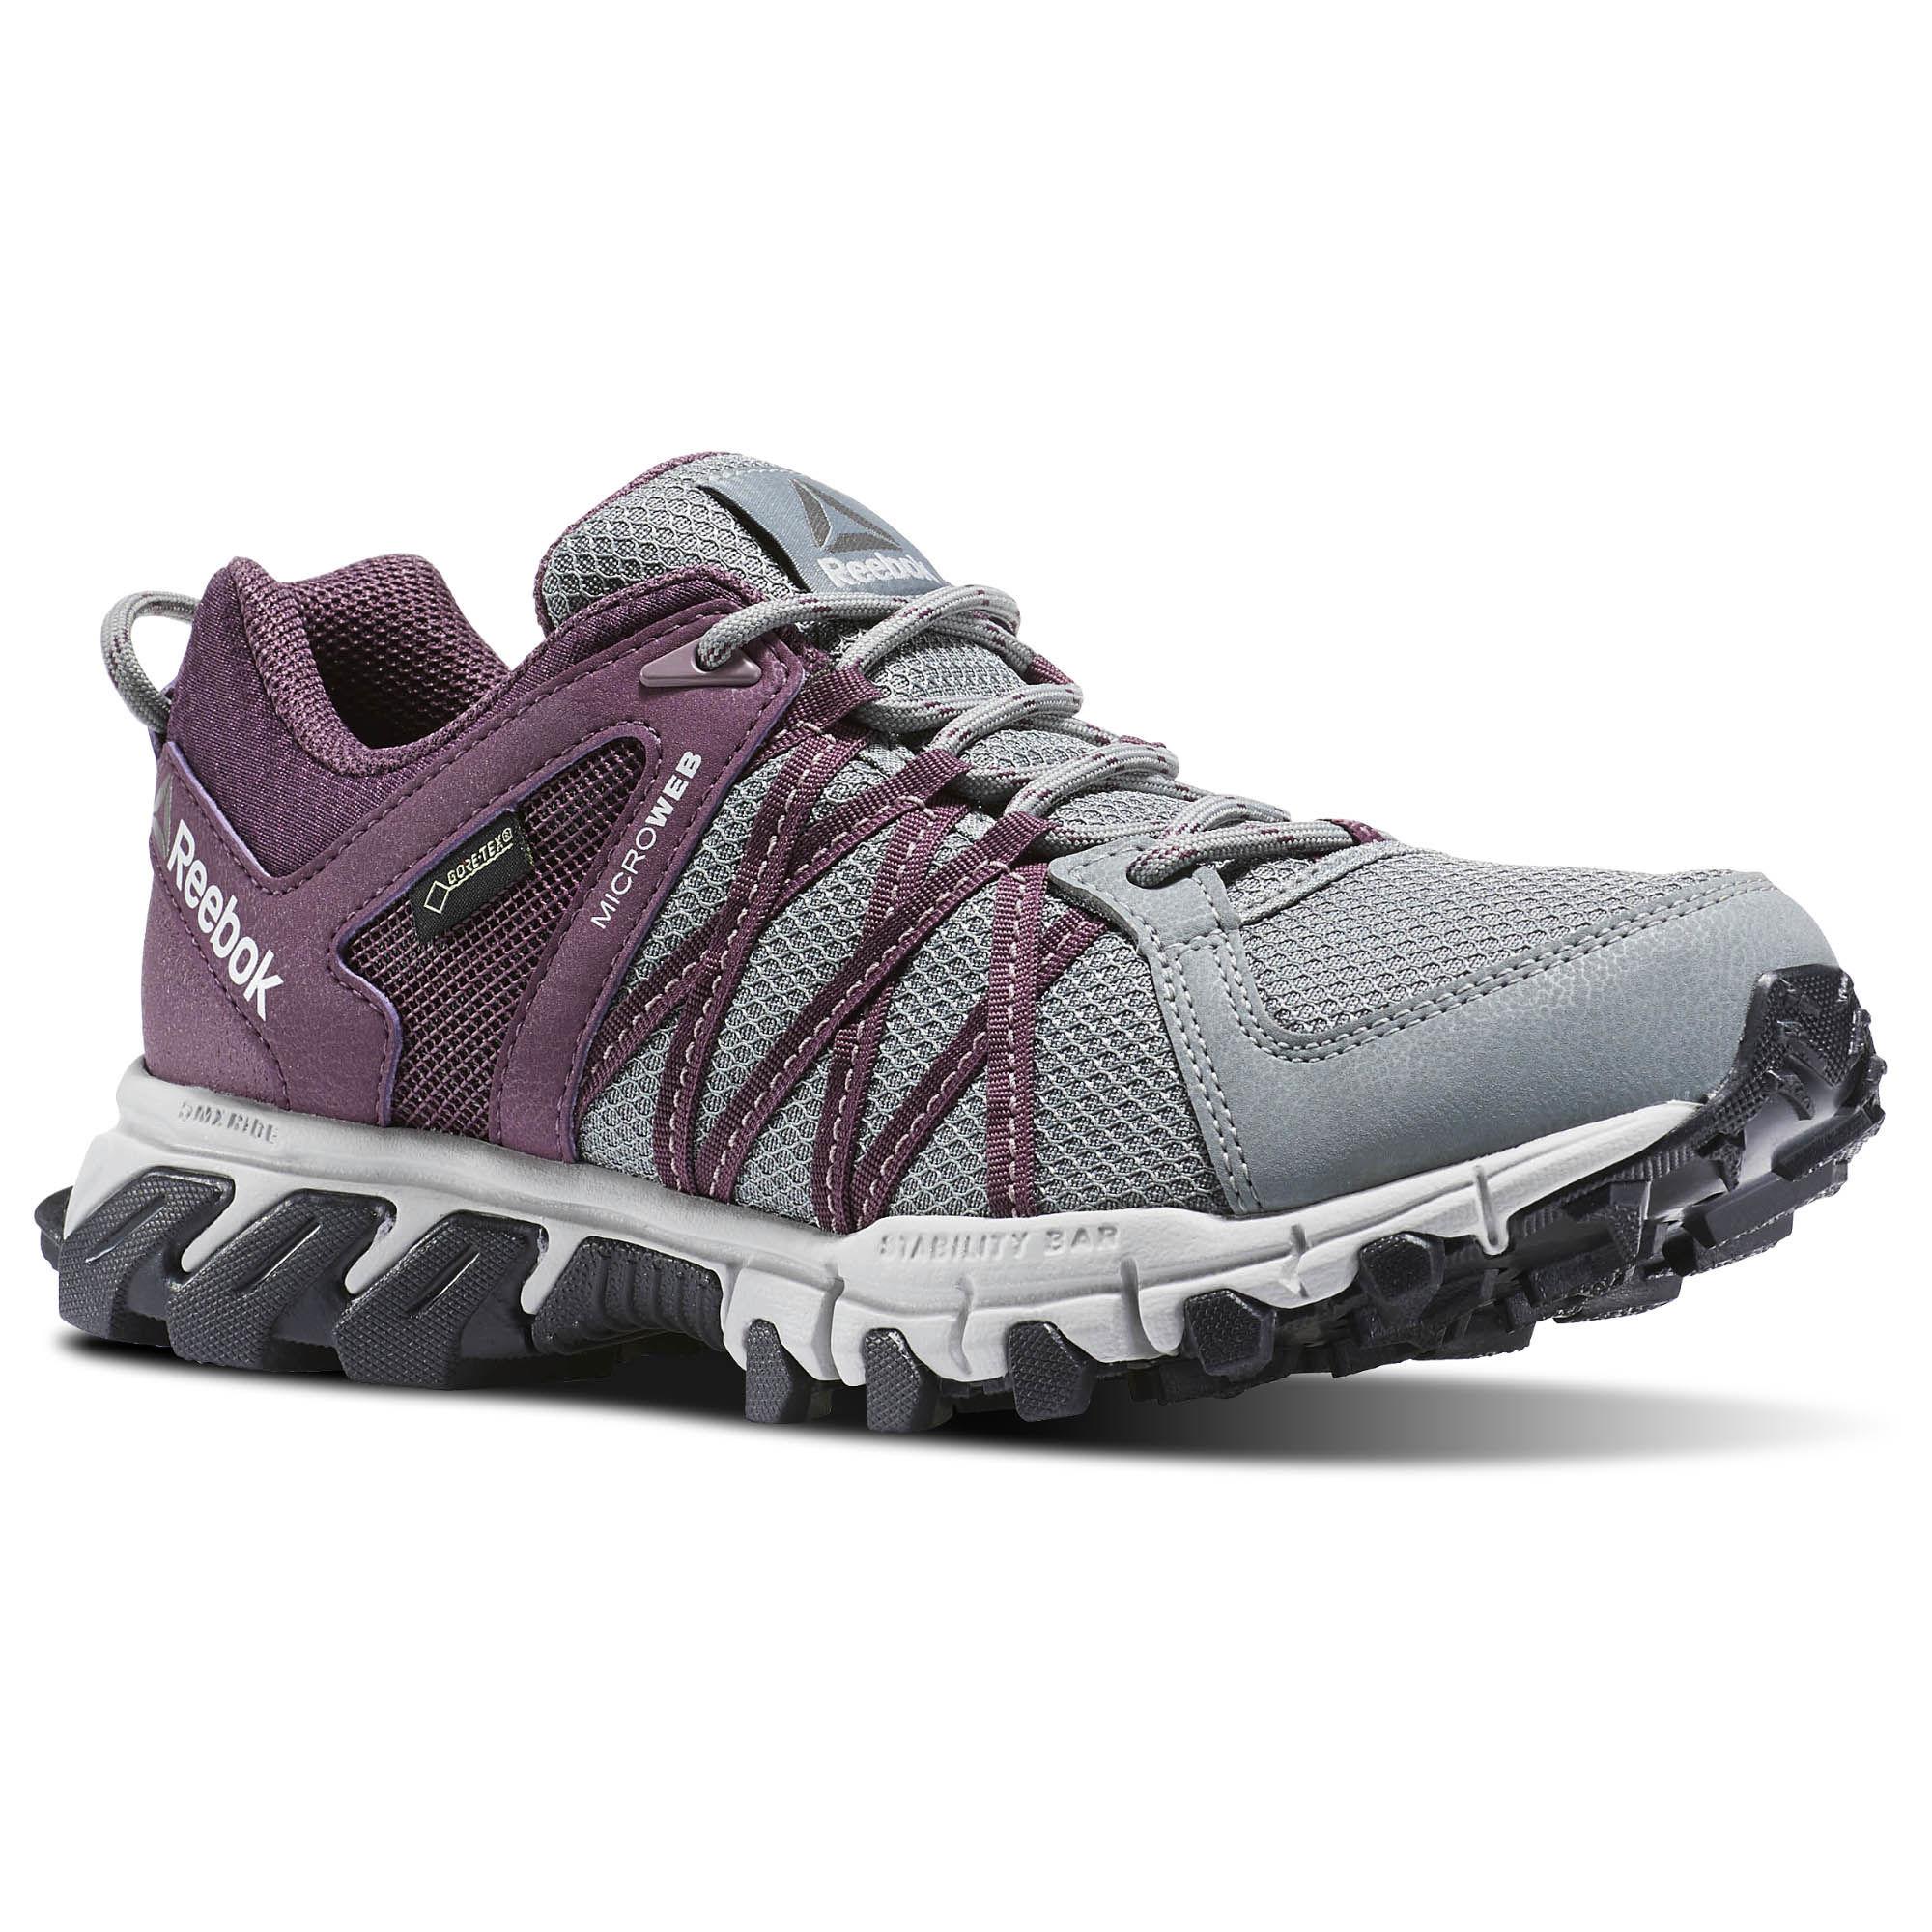 Womens Reebok Goretex TRAILGRIP RS 5.0 GTX - Trail running shoes   £34.90 at Zalando